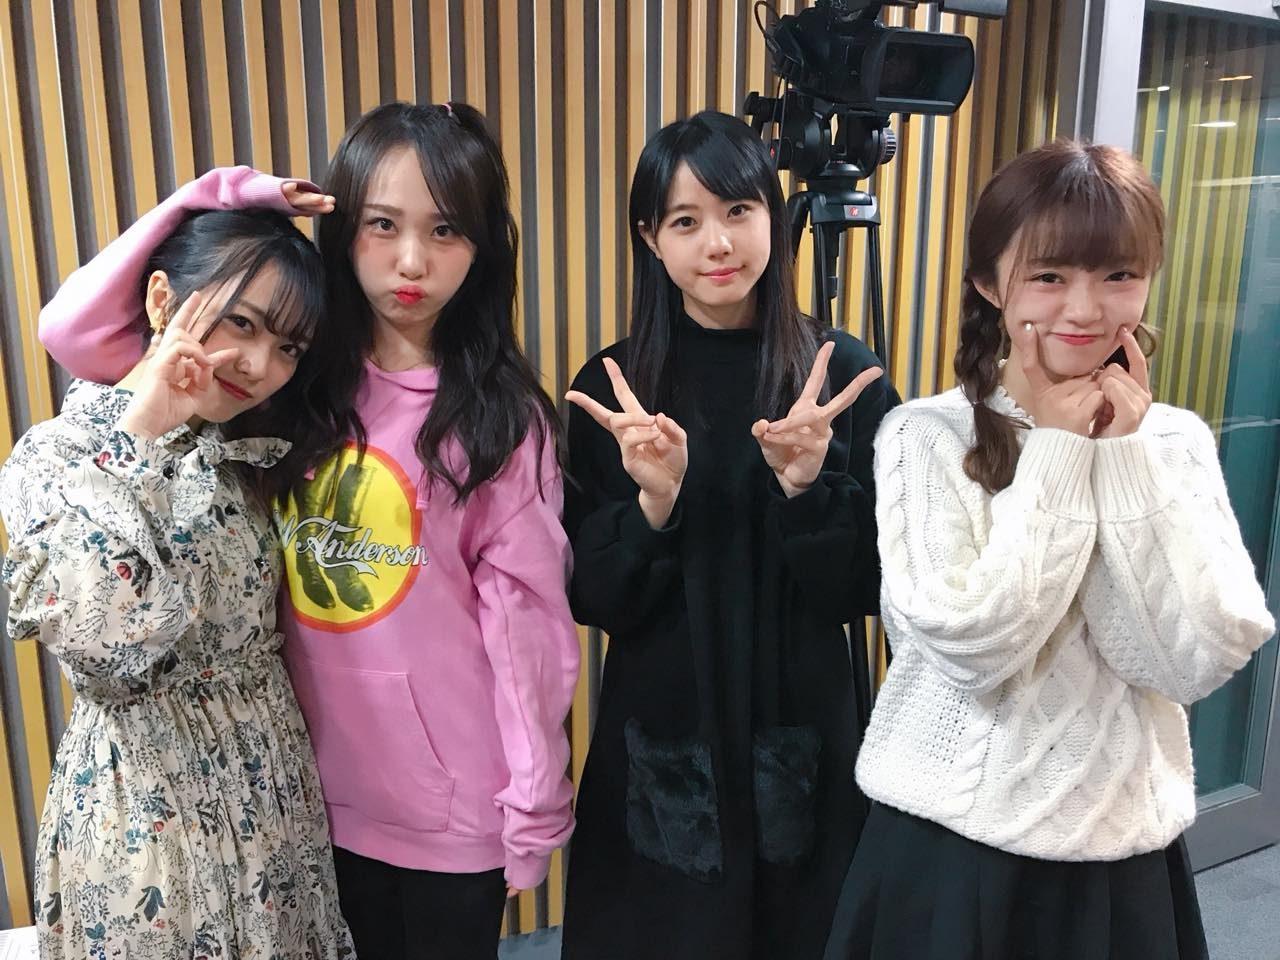 「AKB48のオールナイトニッポン」オフショット * 高橋朱里・向井地美音・中井りか・瀧野由美子